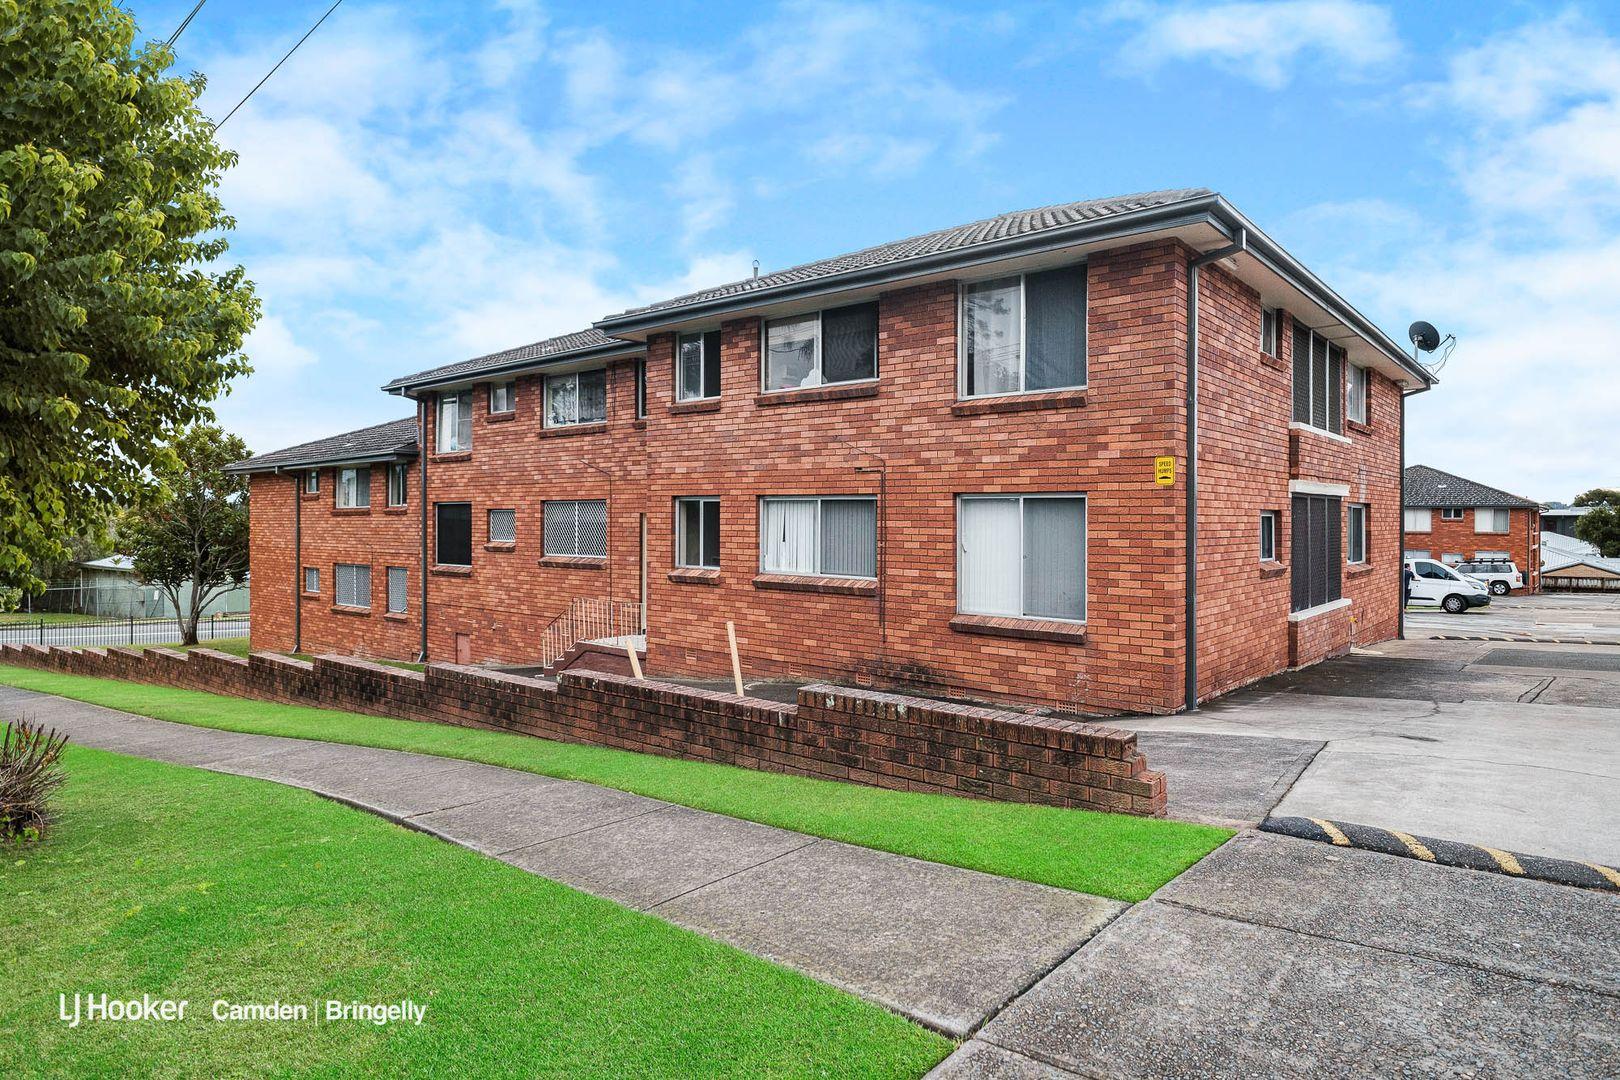 3/102 Dumaresq Street, Campbelltown NSW 2560, Image 0